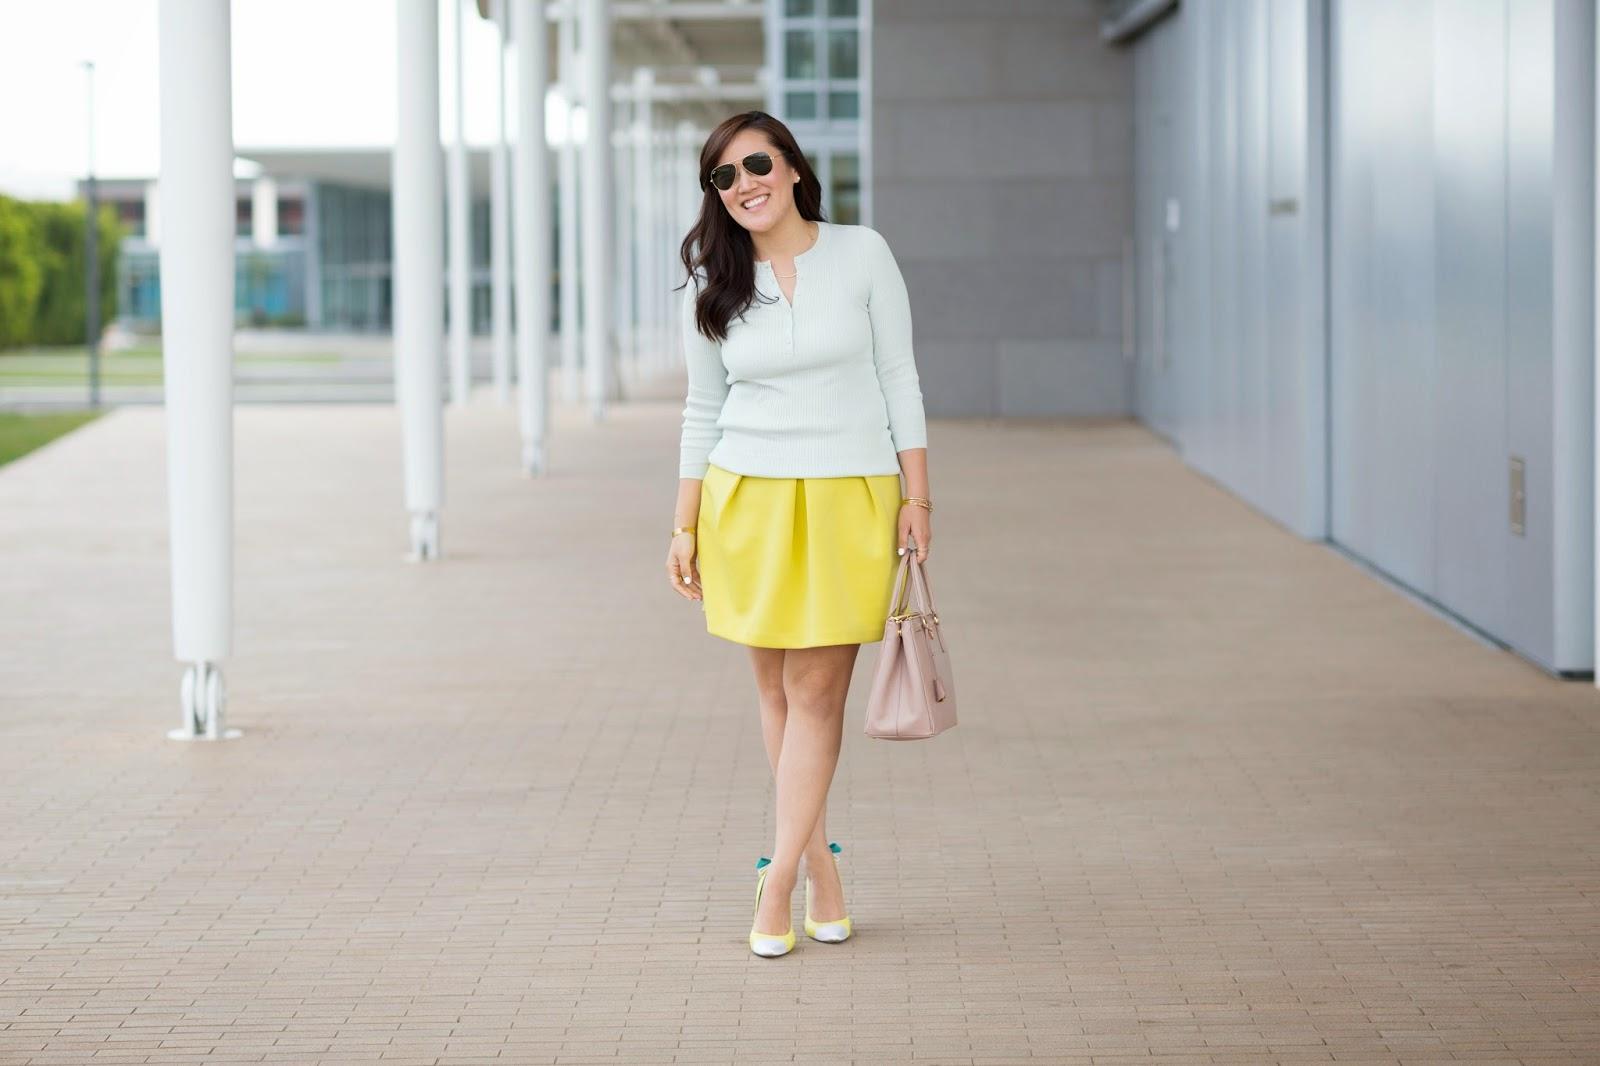 simplyxclassic, mint top, yellow skirt, prada bag, gap, asos, orange county, fashion blogger